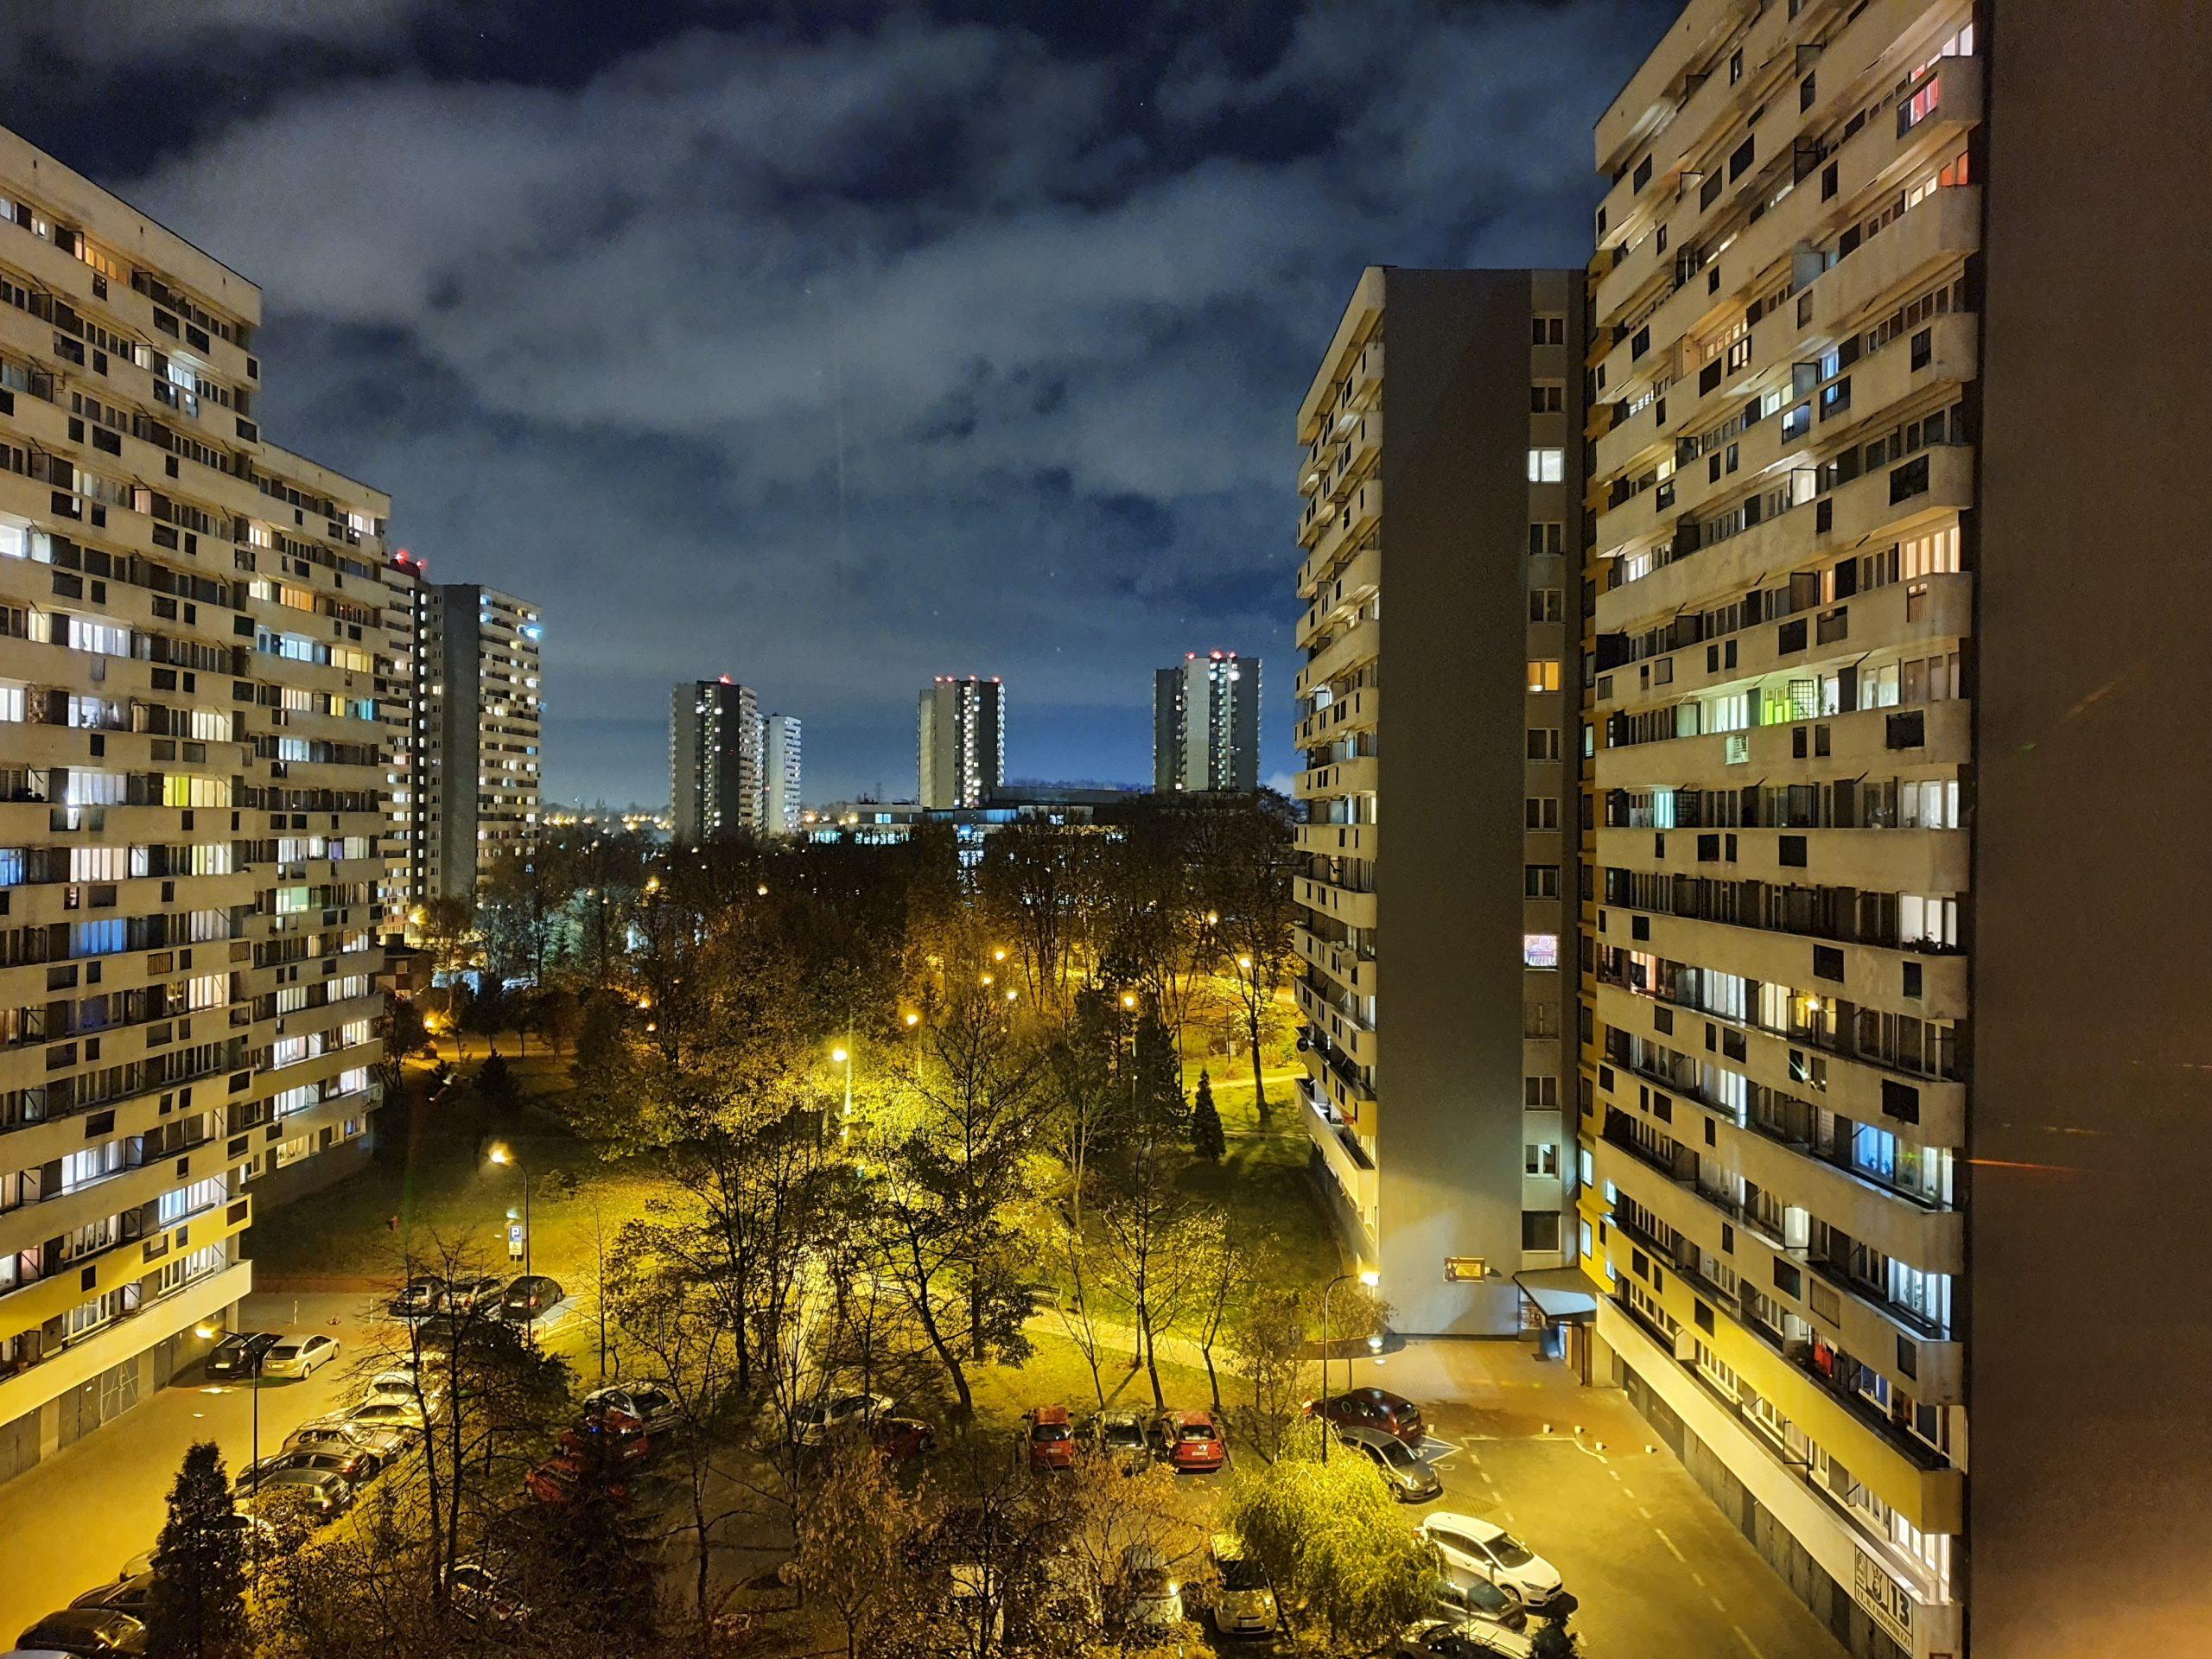 Zdjęcia nocne - Samsung Galaxy Note10